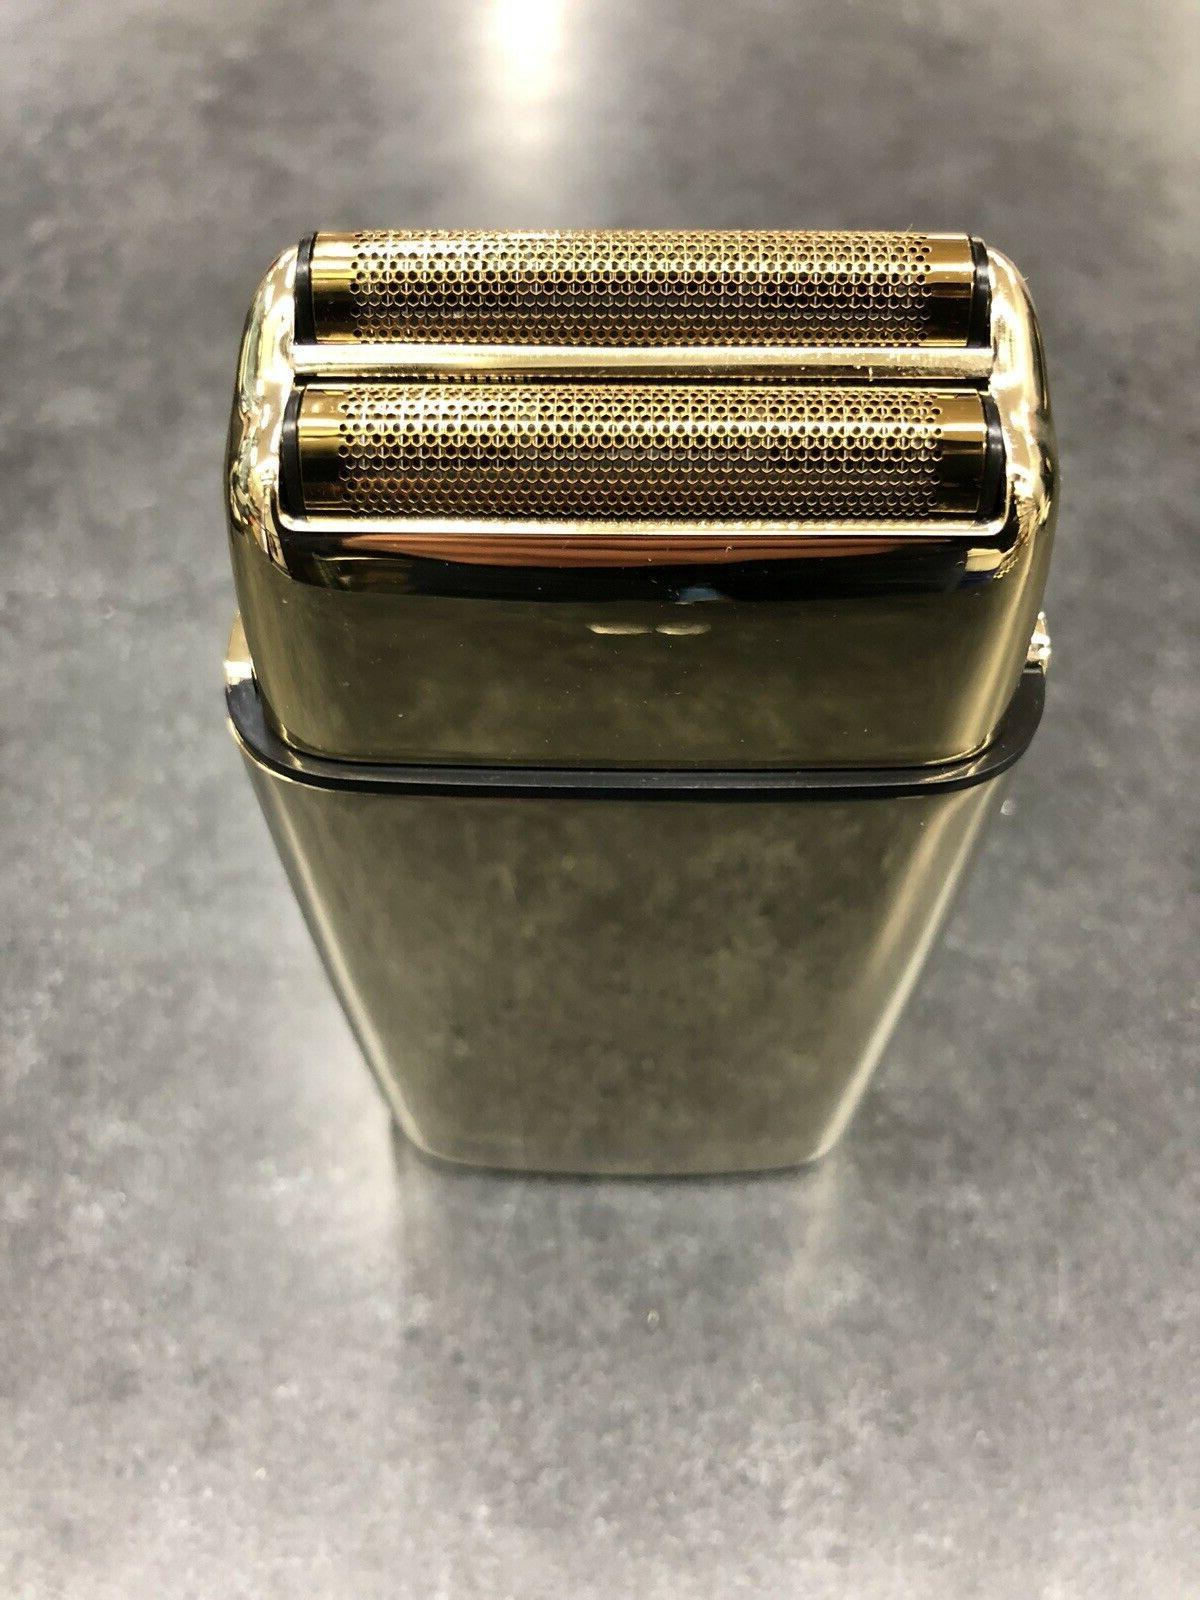 BaByliss FOILFX02™ Metal Shaver